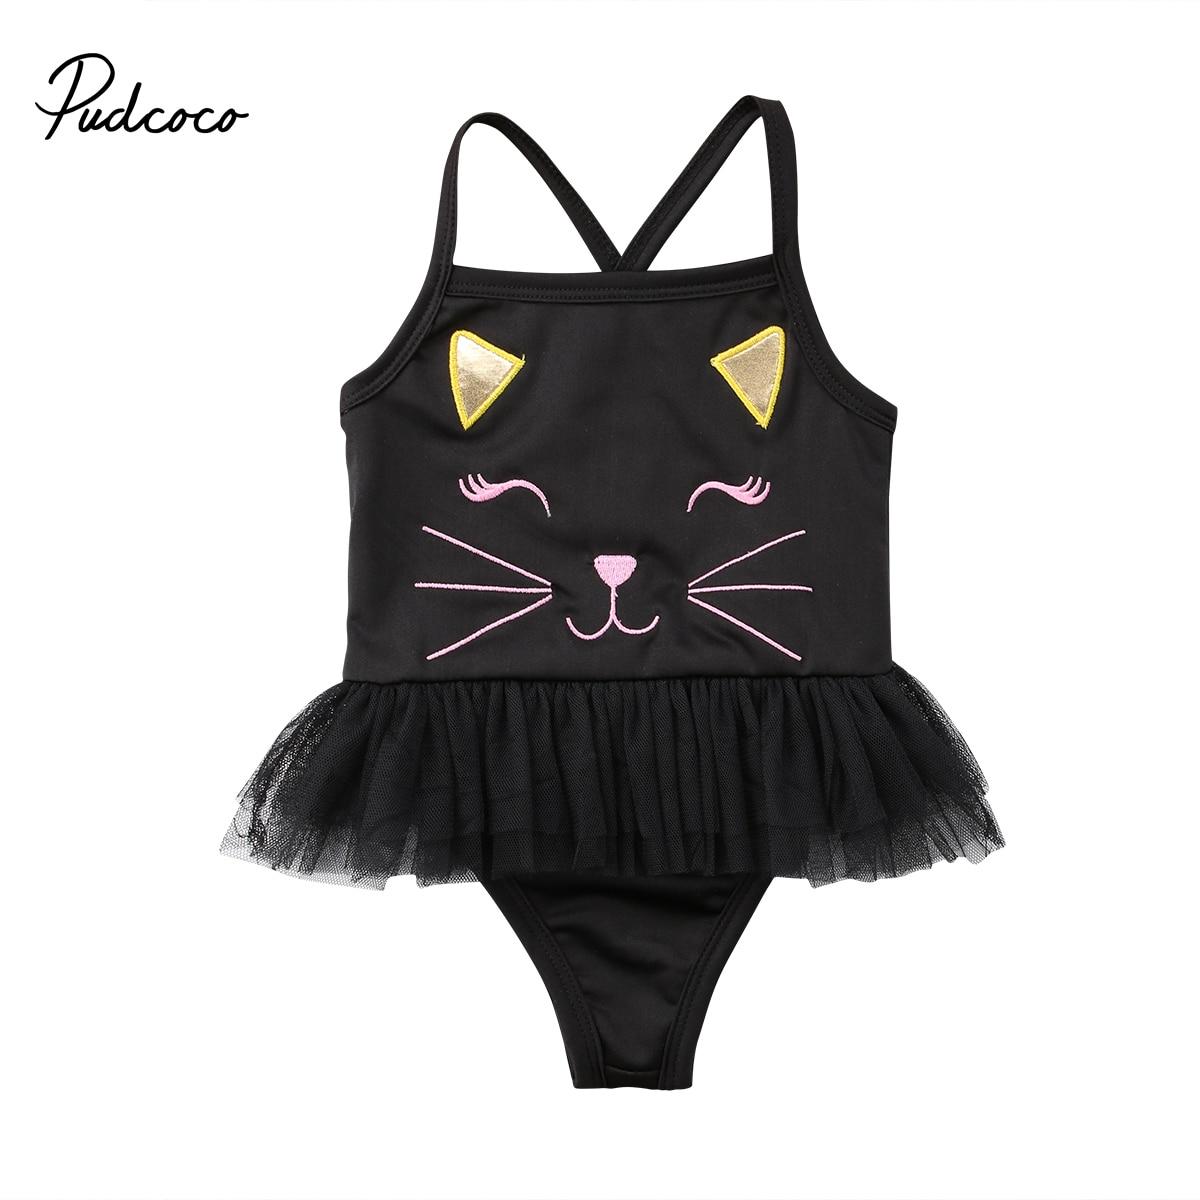 2018 NEW Swimwear Kids Baby Girls Cartoon Cat Tulle One-piece Swimwear Lace Swimsuit Bathing Clothes 1-3T